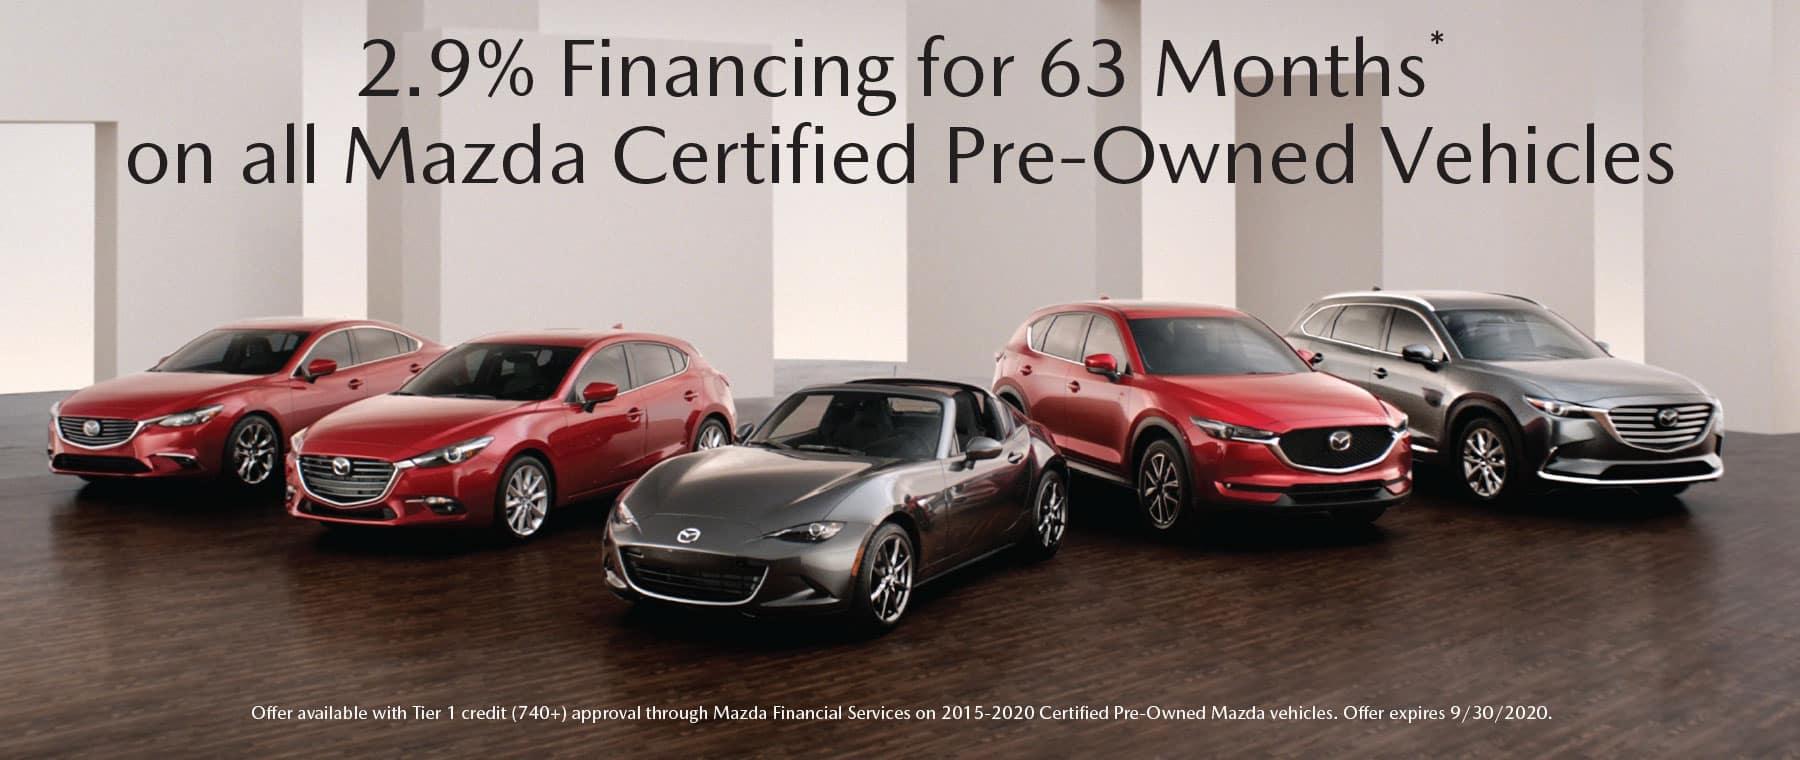 s CPO APR Special Offer Garden City Mazda NY